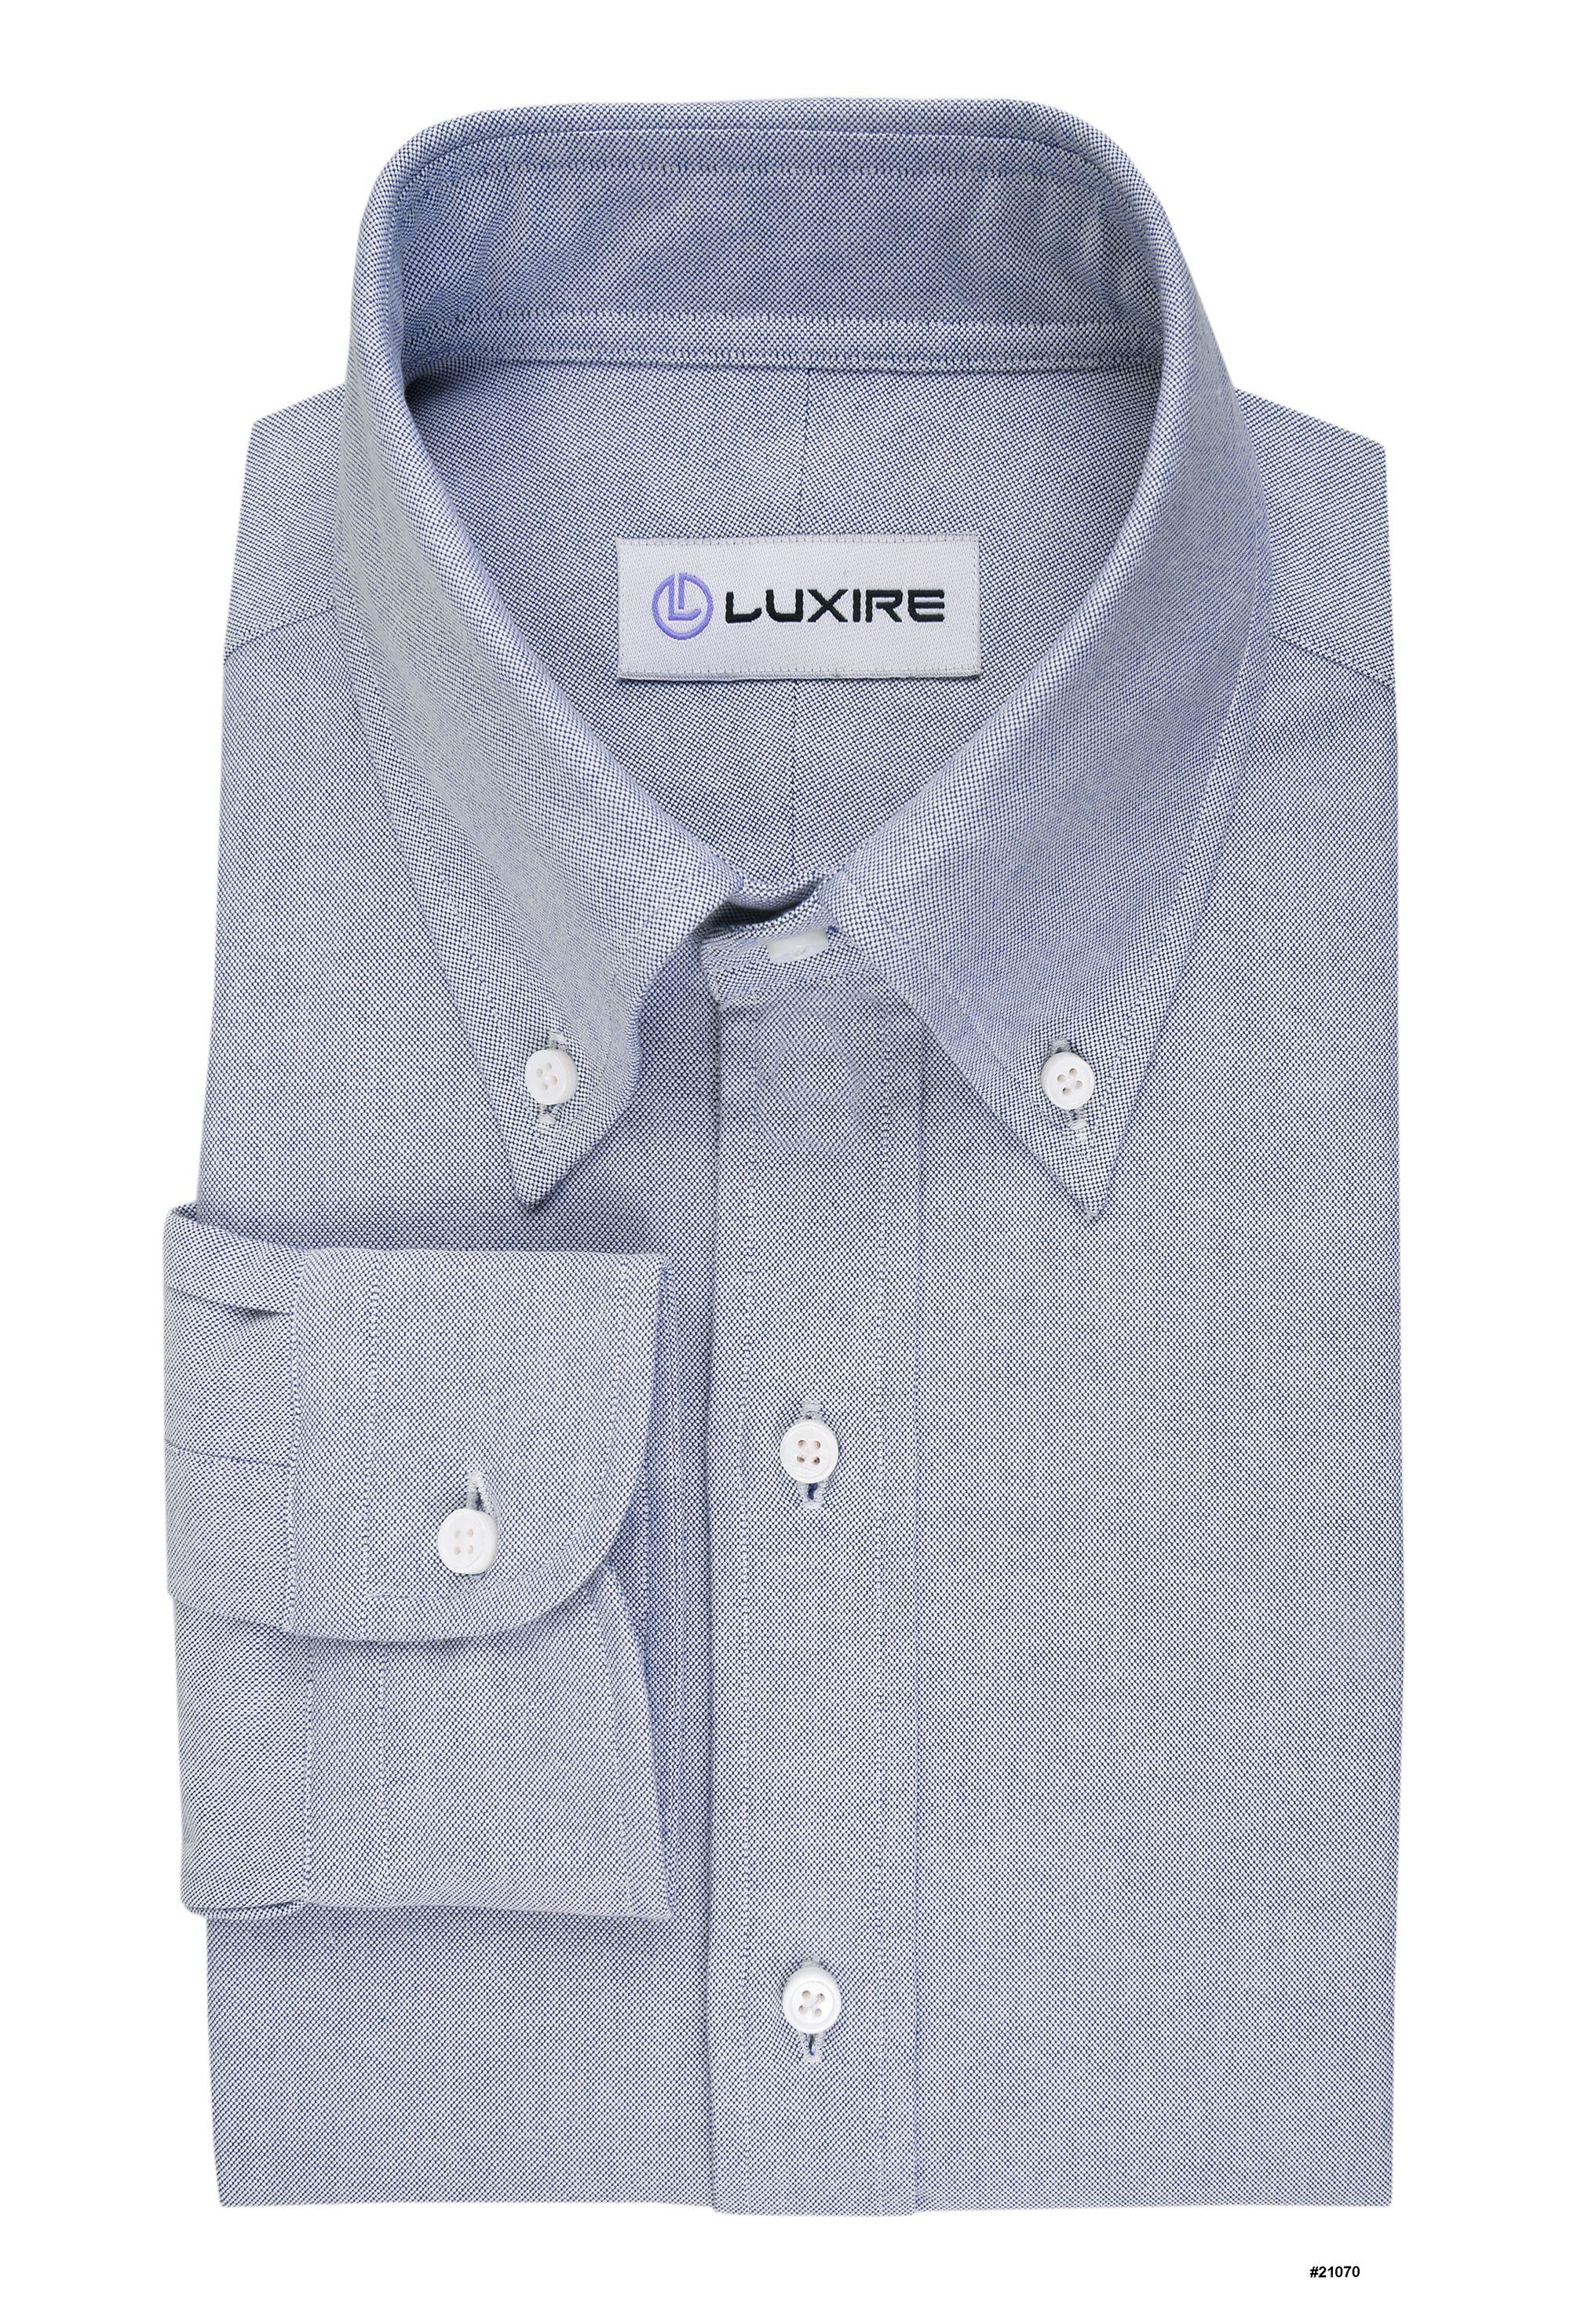 Ensign Blue On White Oxford Luxire Shirts Oxford White Button